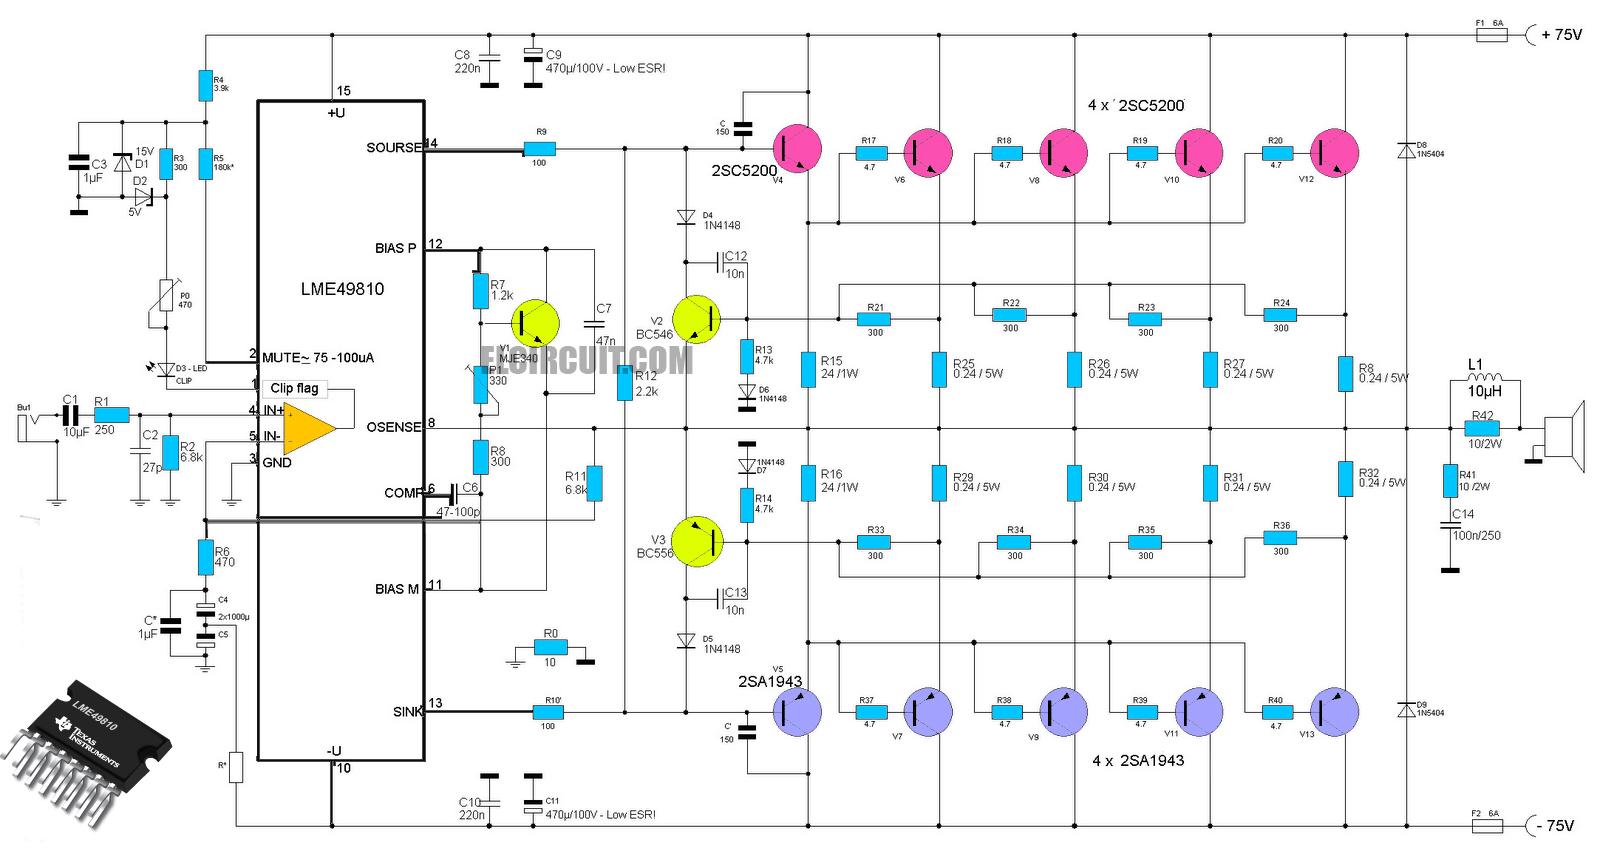 2000w Power Amplifier Circuit Diagram 99 Jeep Grand Cherokee Wiring High End Lme49810 2sc5200 2sa1943